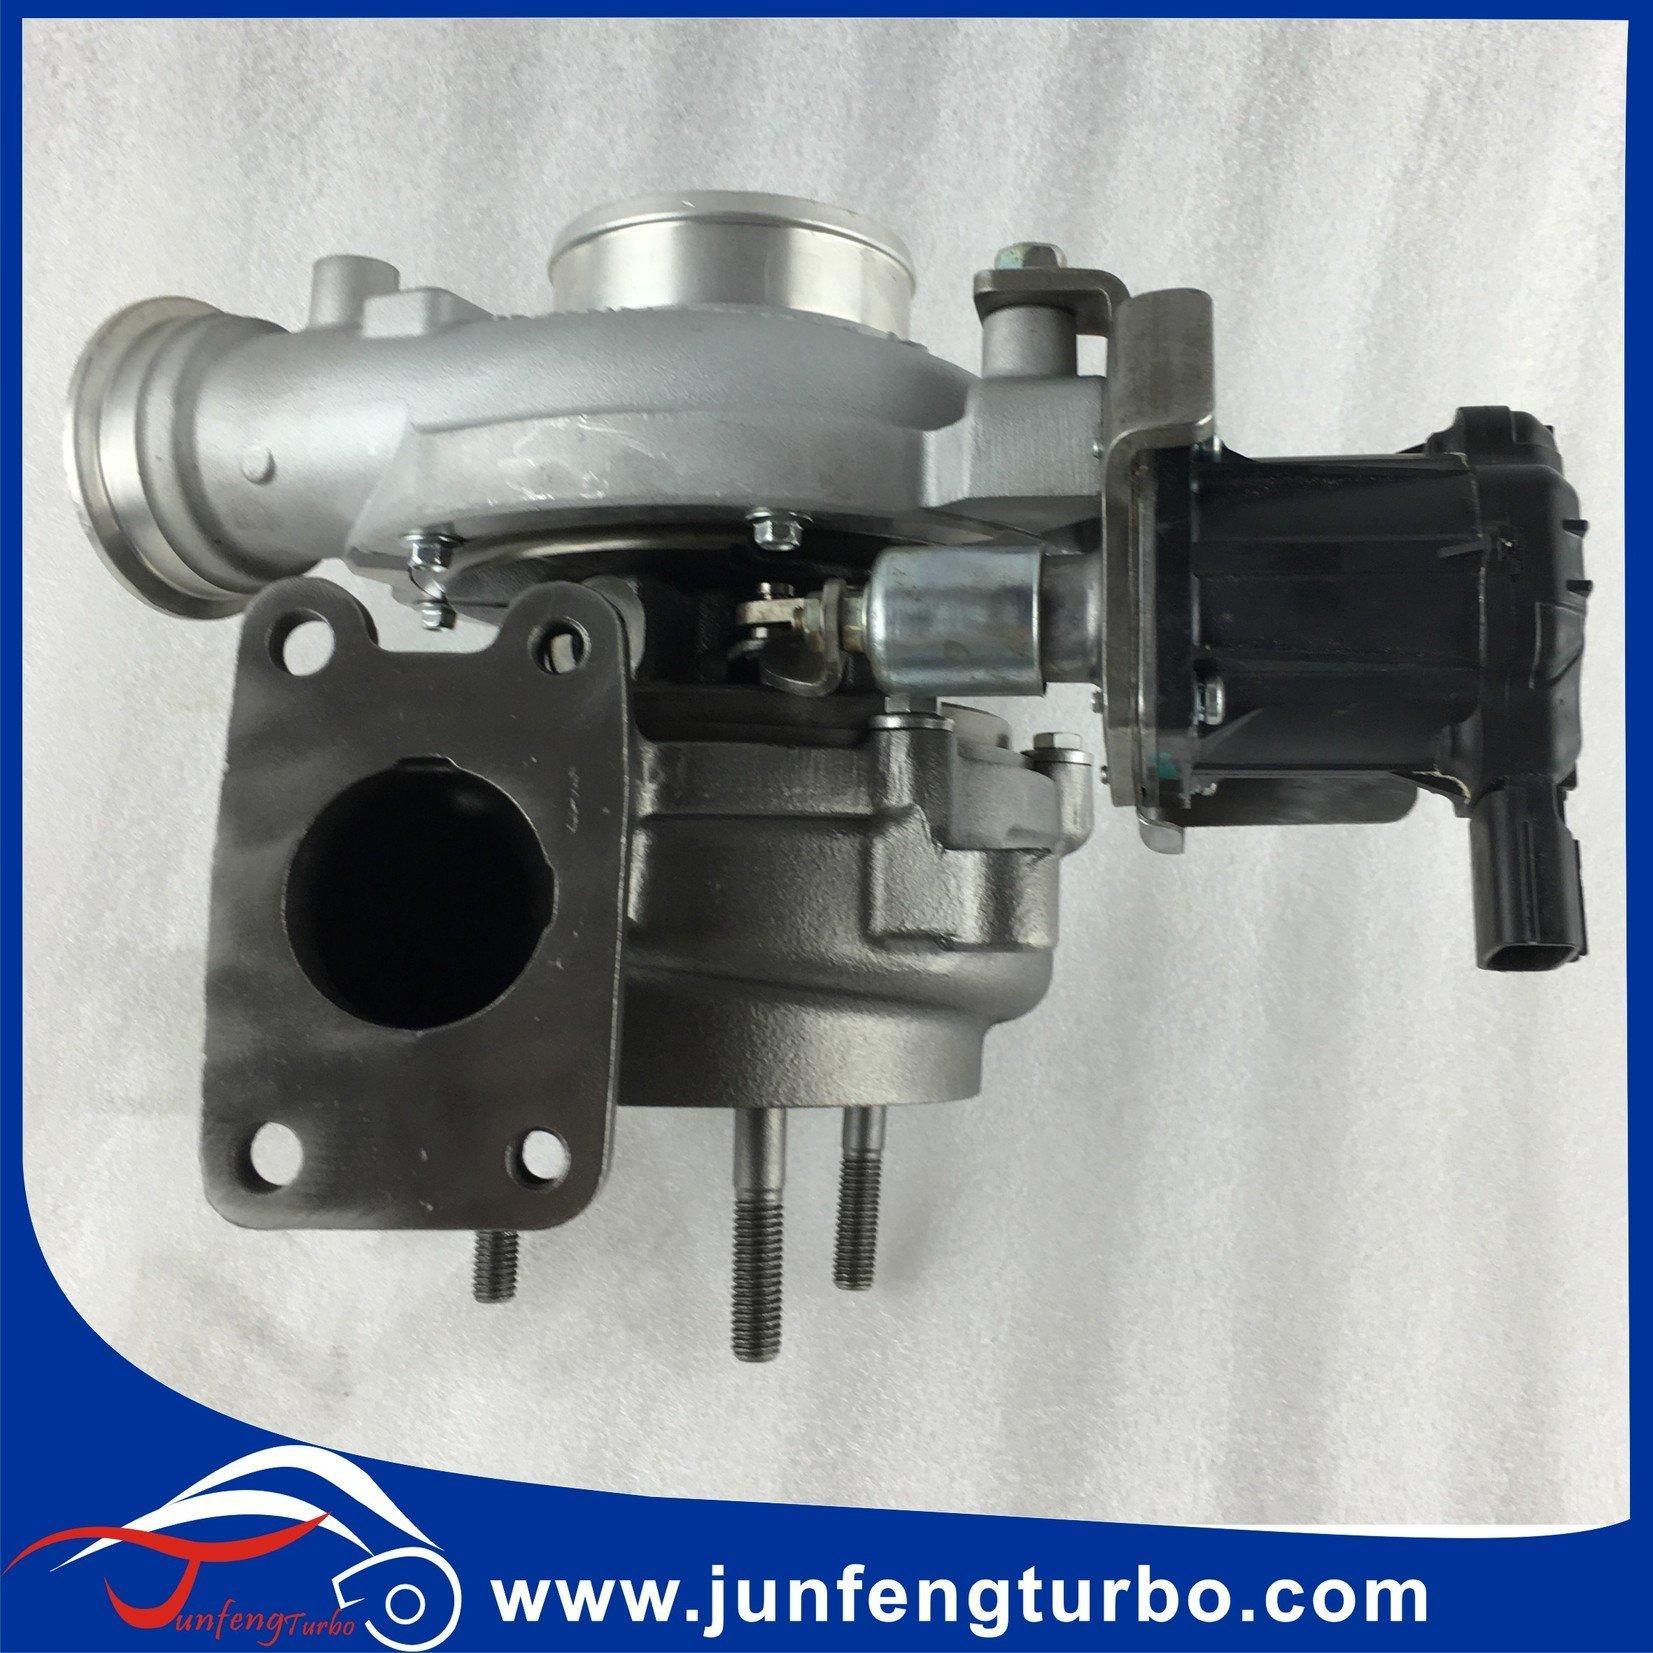 GT20V Isuzu turbo 821142-0001 electric turbocharger 7004300X2